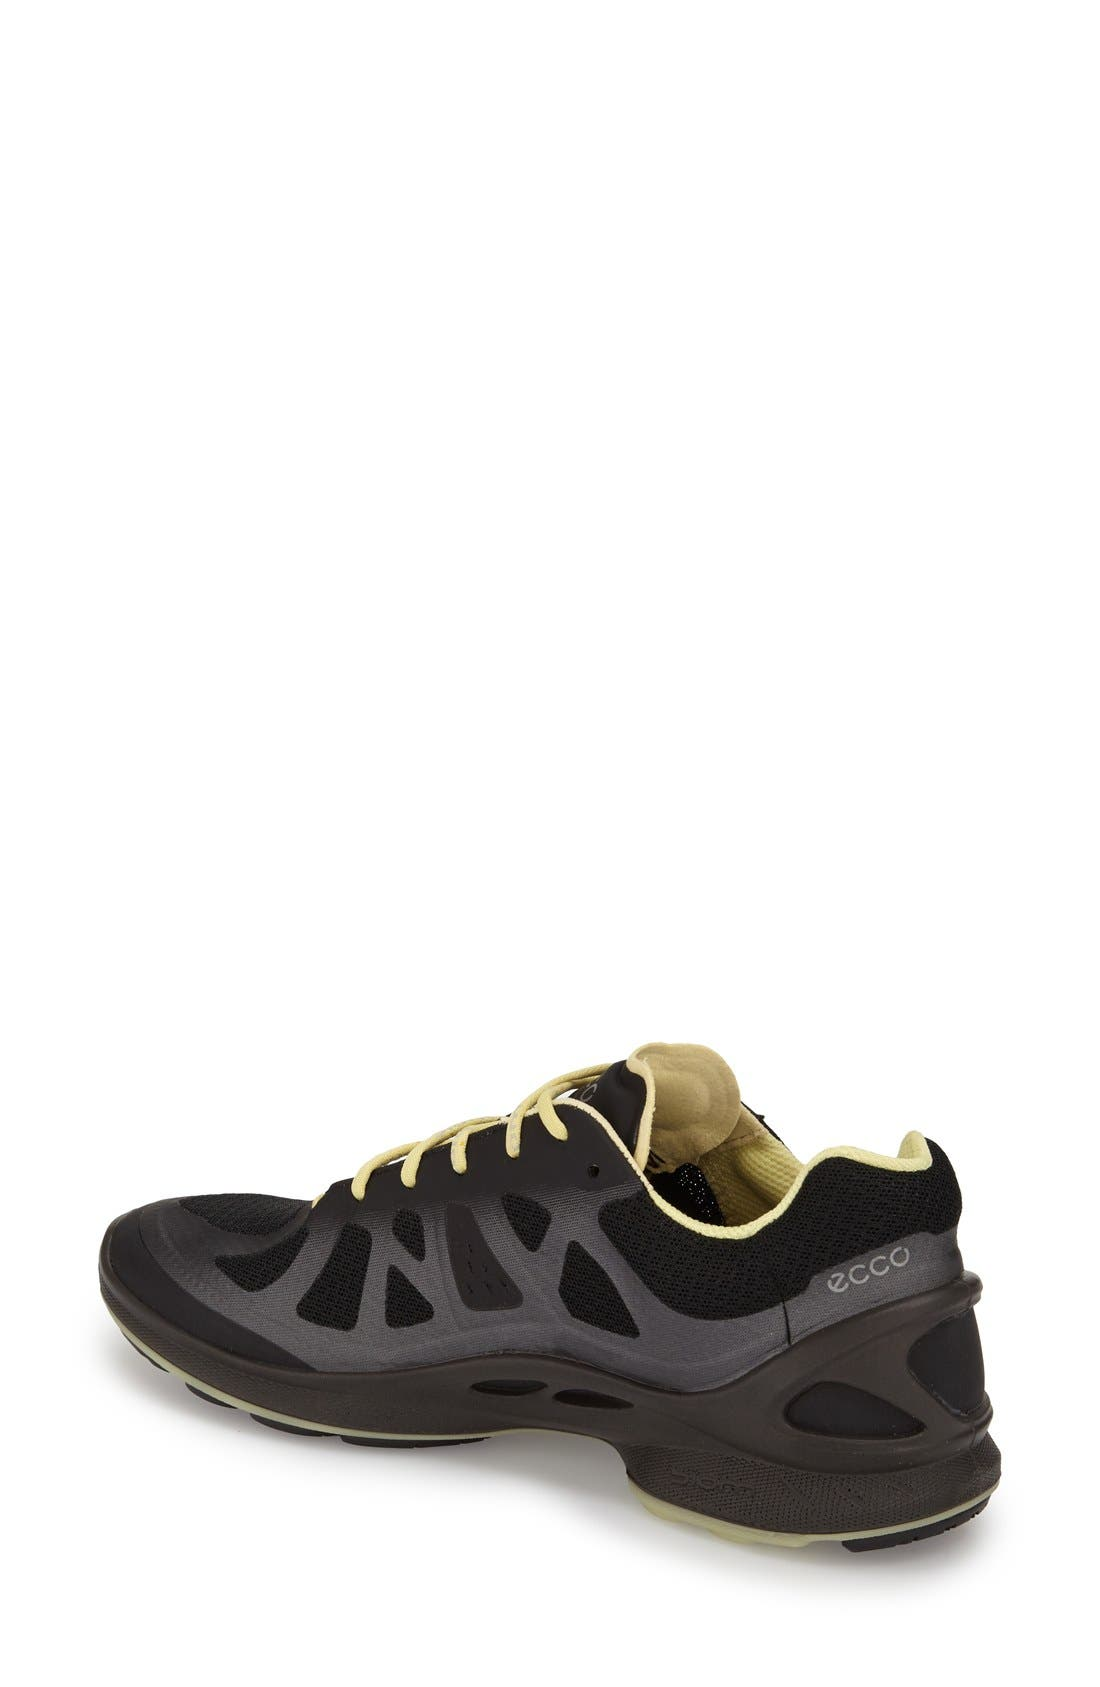 ECCO, 'BIOM Fjuel Racer' Sneaker, Alternate thumbnail 2, color, 017